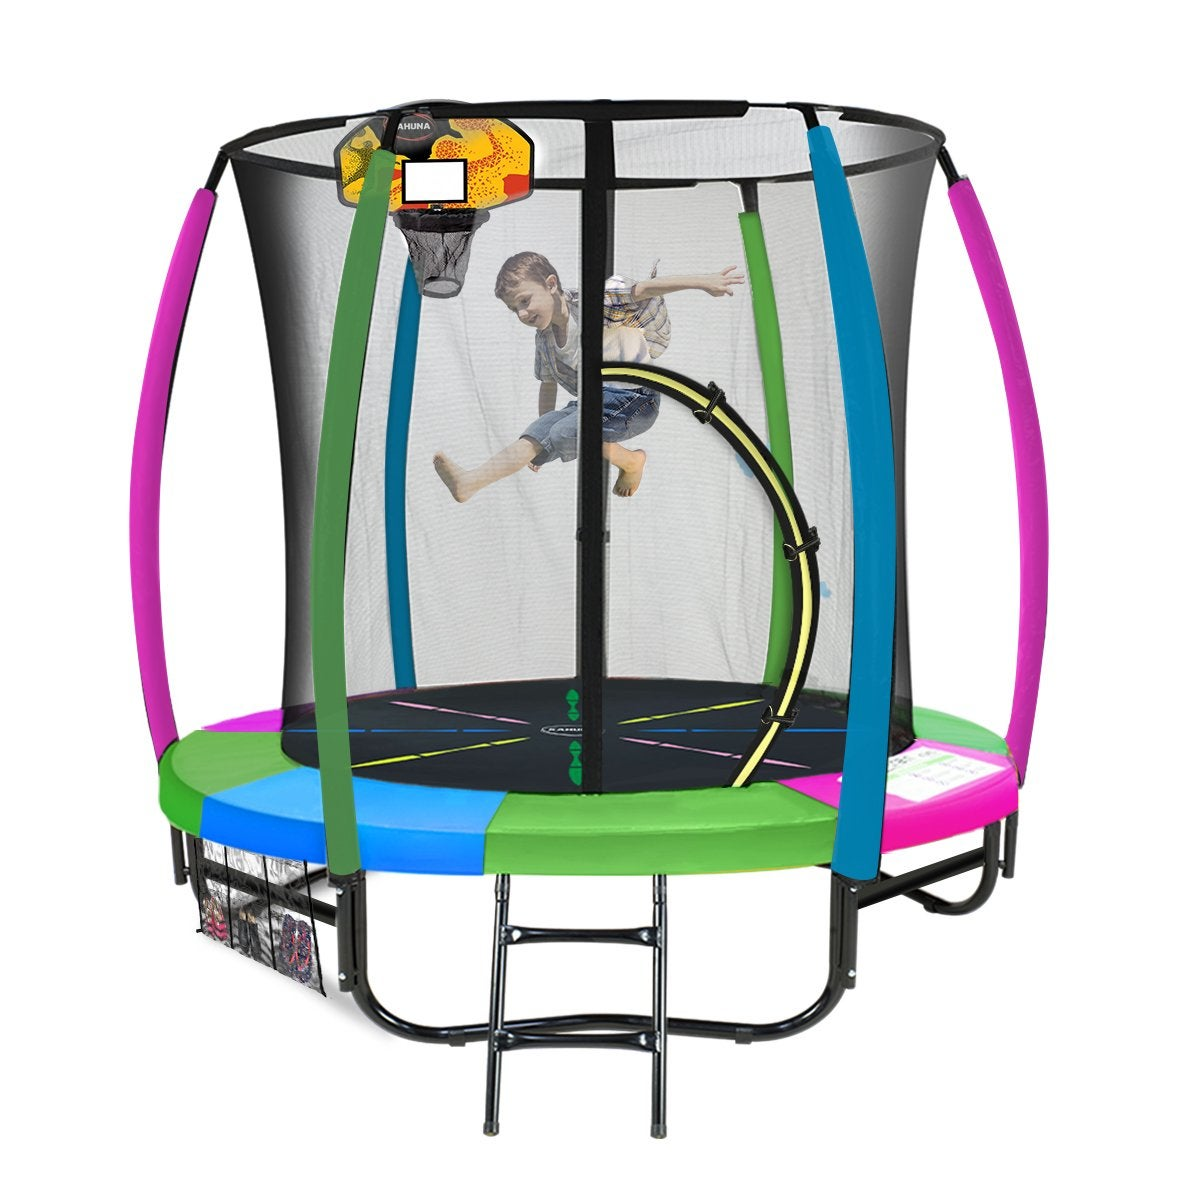 Kahuna Trampoline 6ft with Basketball Set - Rainbow